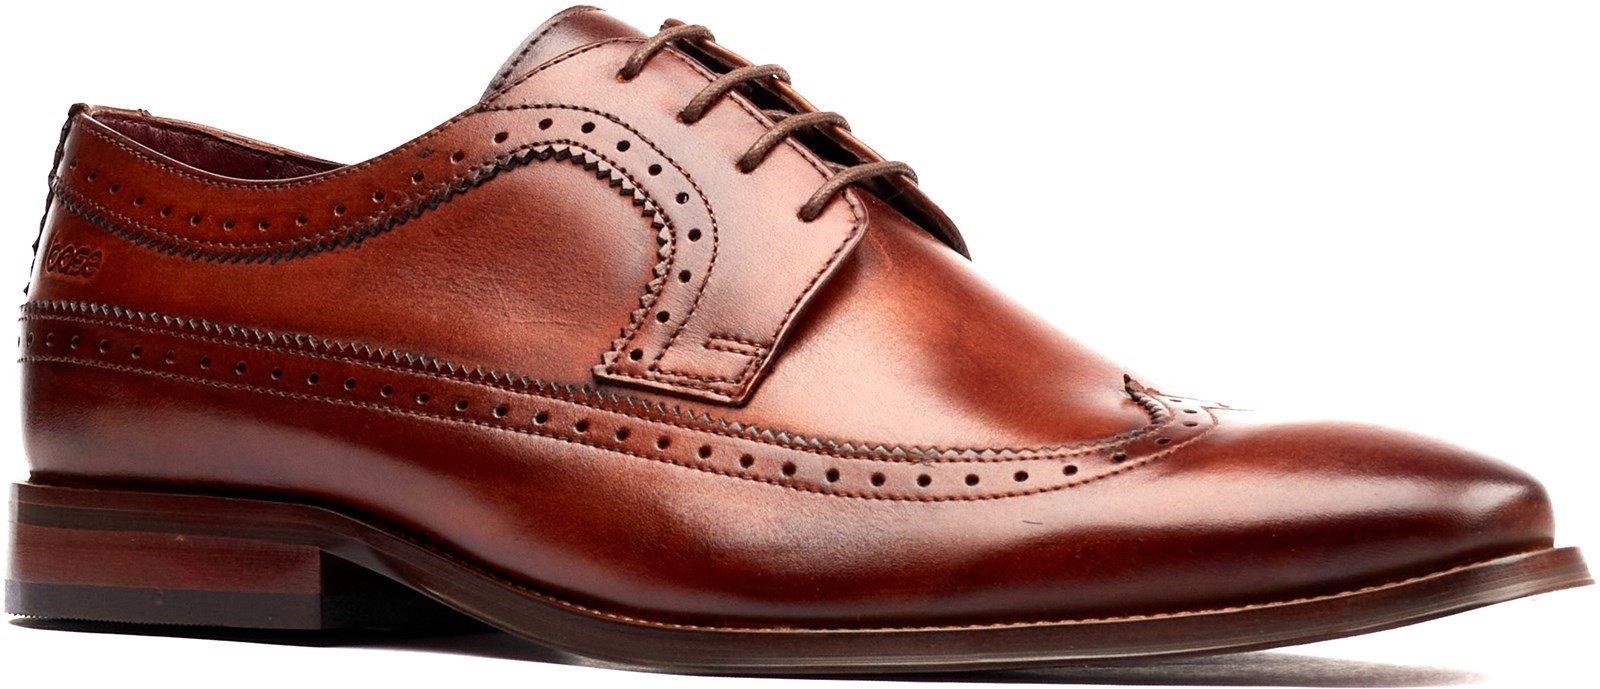 Base London Men's Havisham Plain Toe Derby Shoe Various Colours 32247 - Tan 7